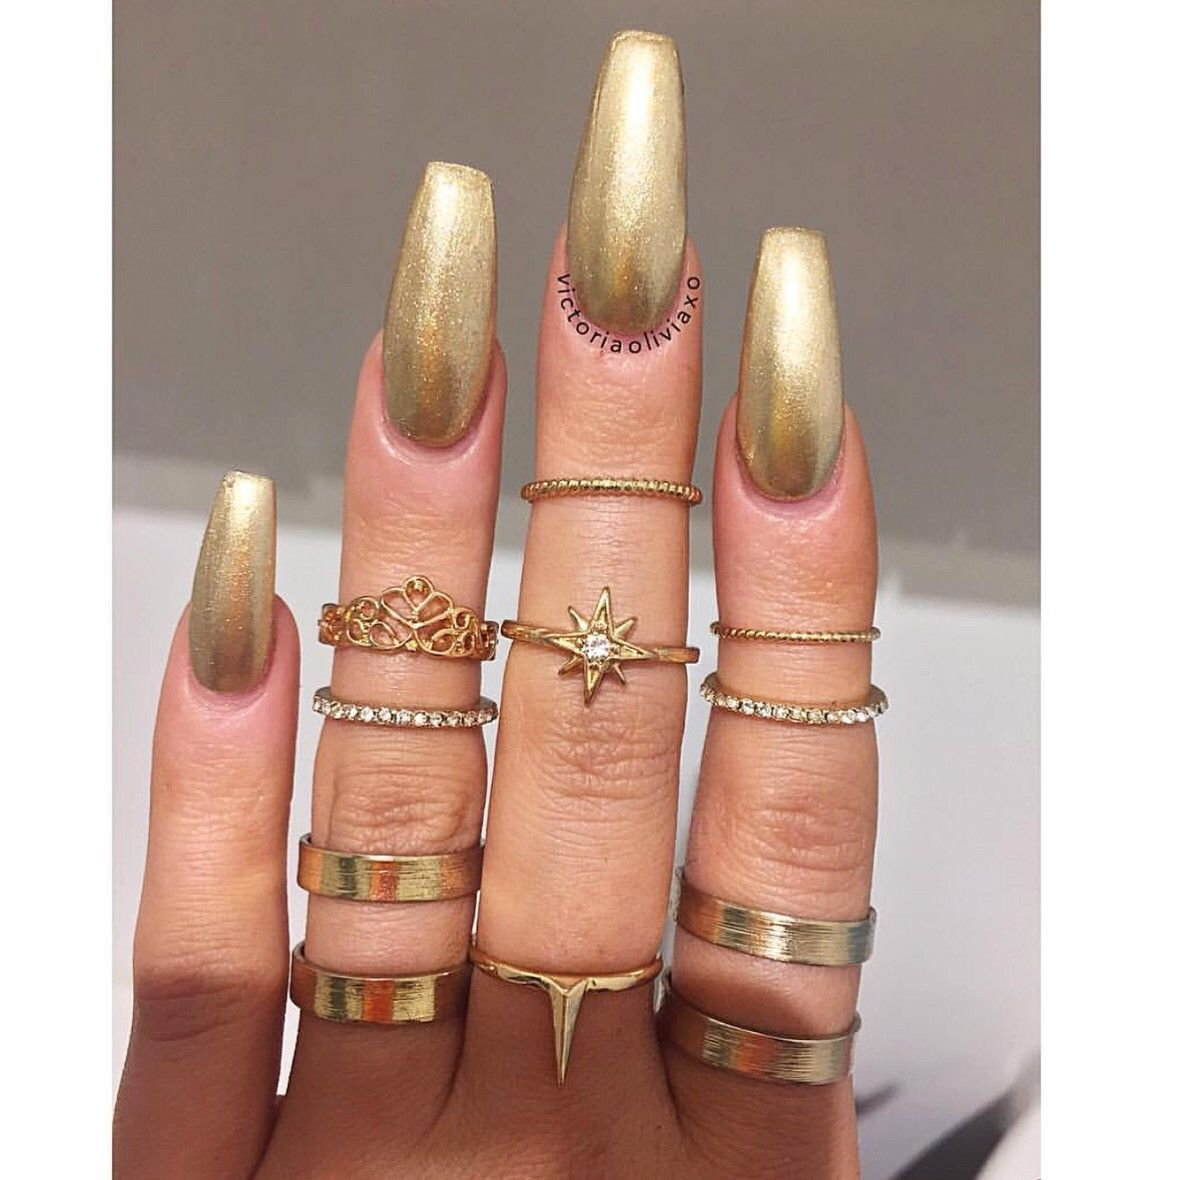 Trophy wife | Fingernägel, Nagelschere und Trendige nägel